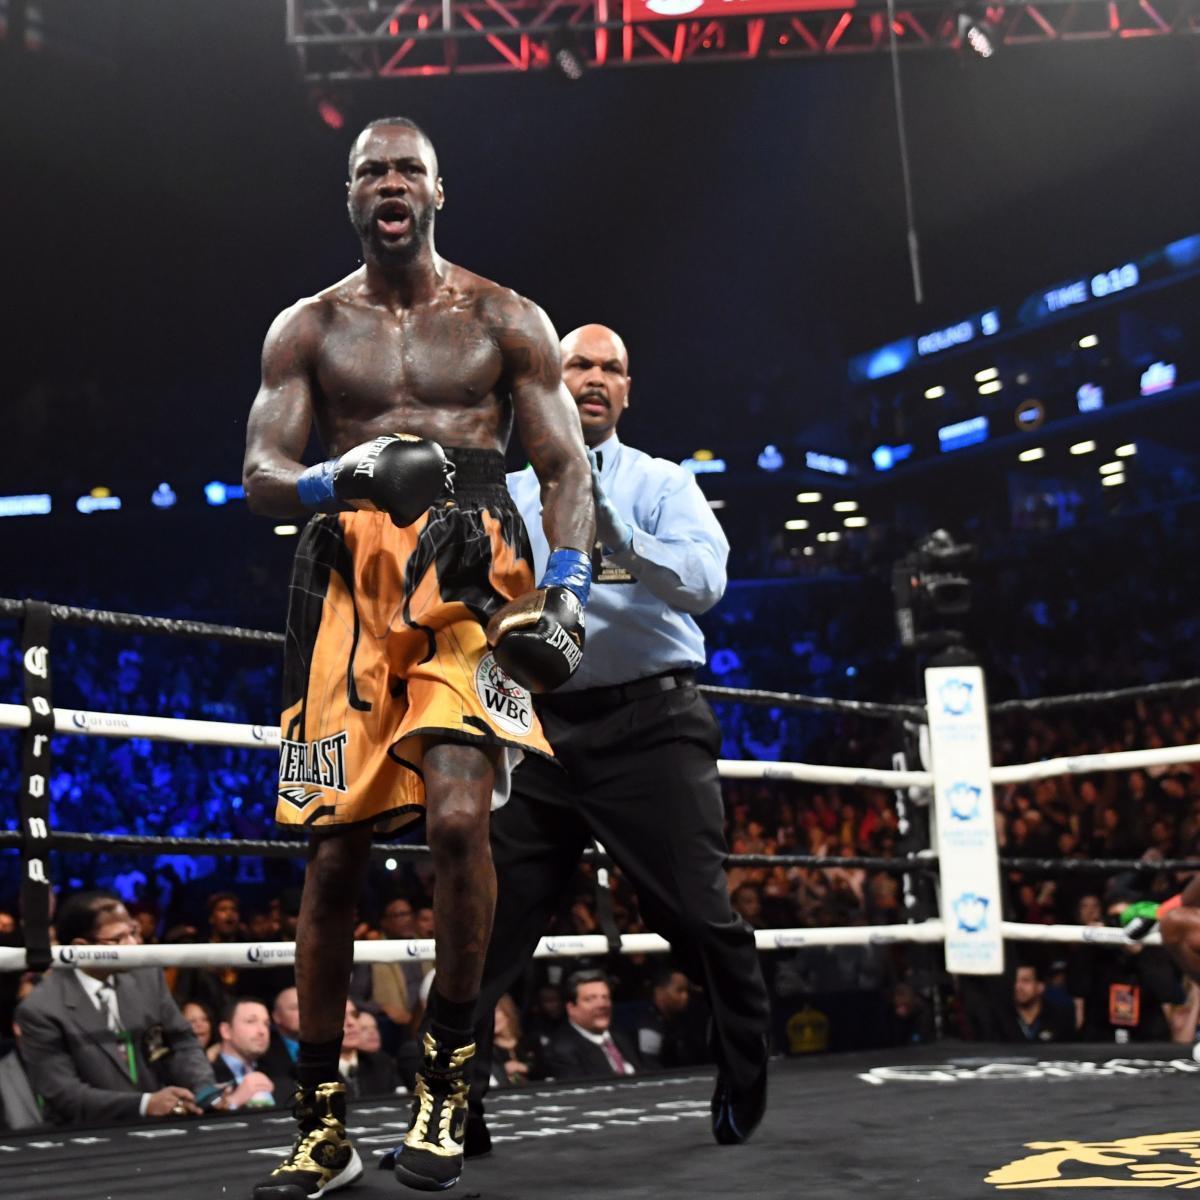 Deontay Wilder Beats Luis Ortiz Via 10th-Round TKO To Stay